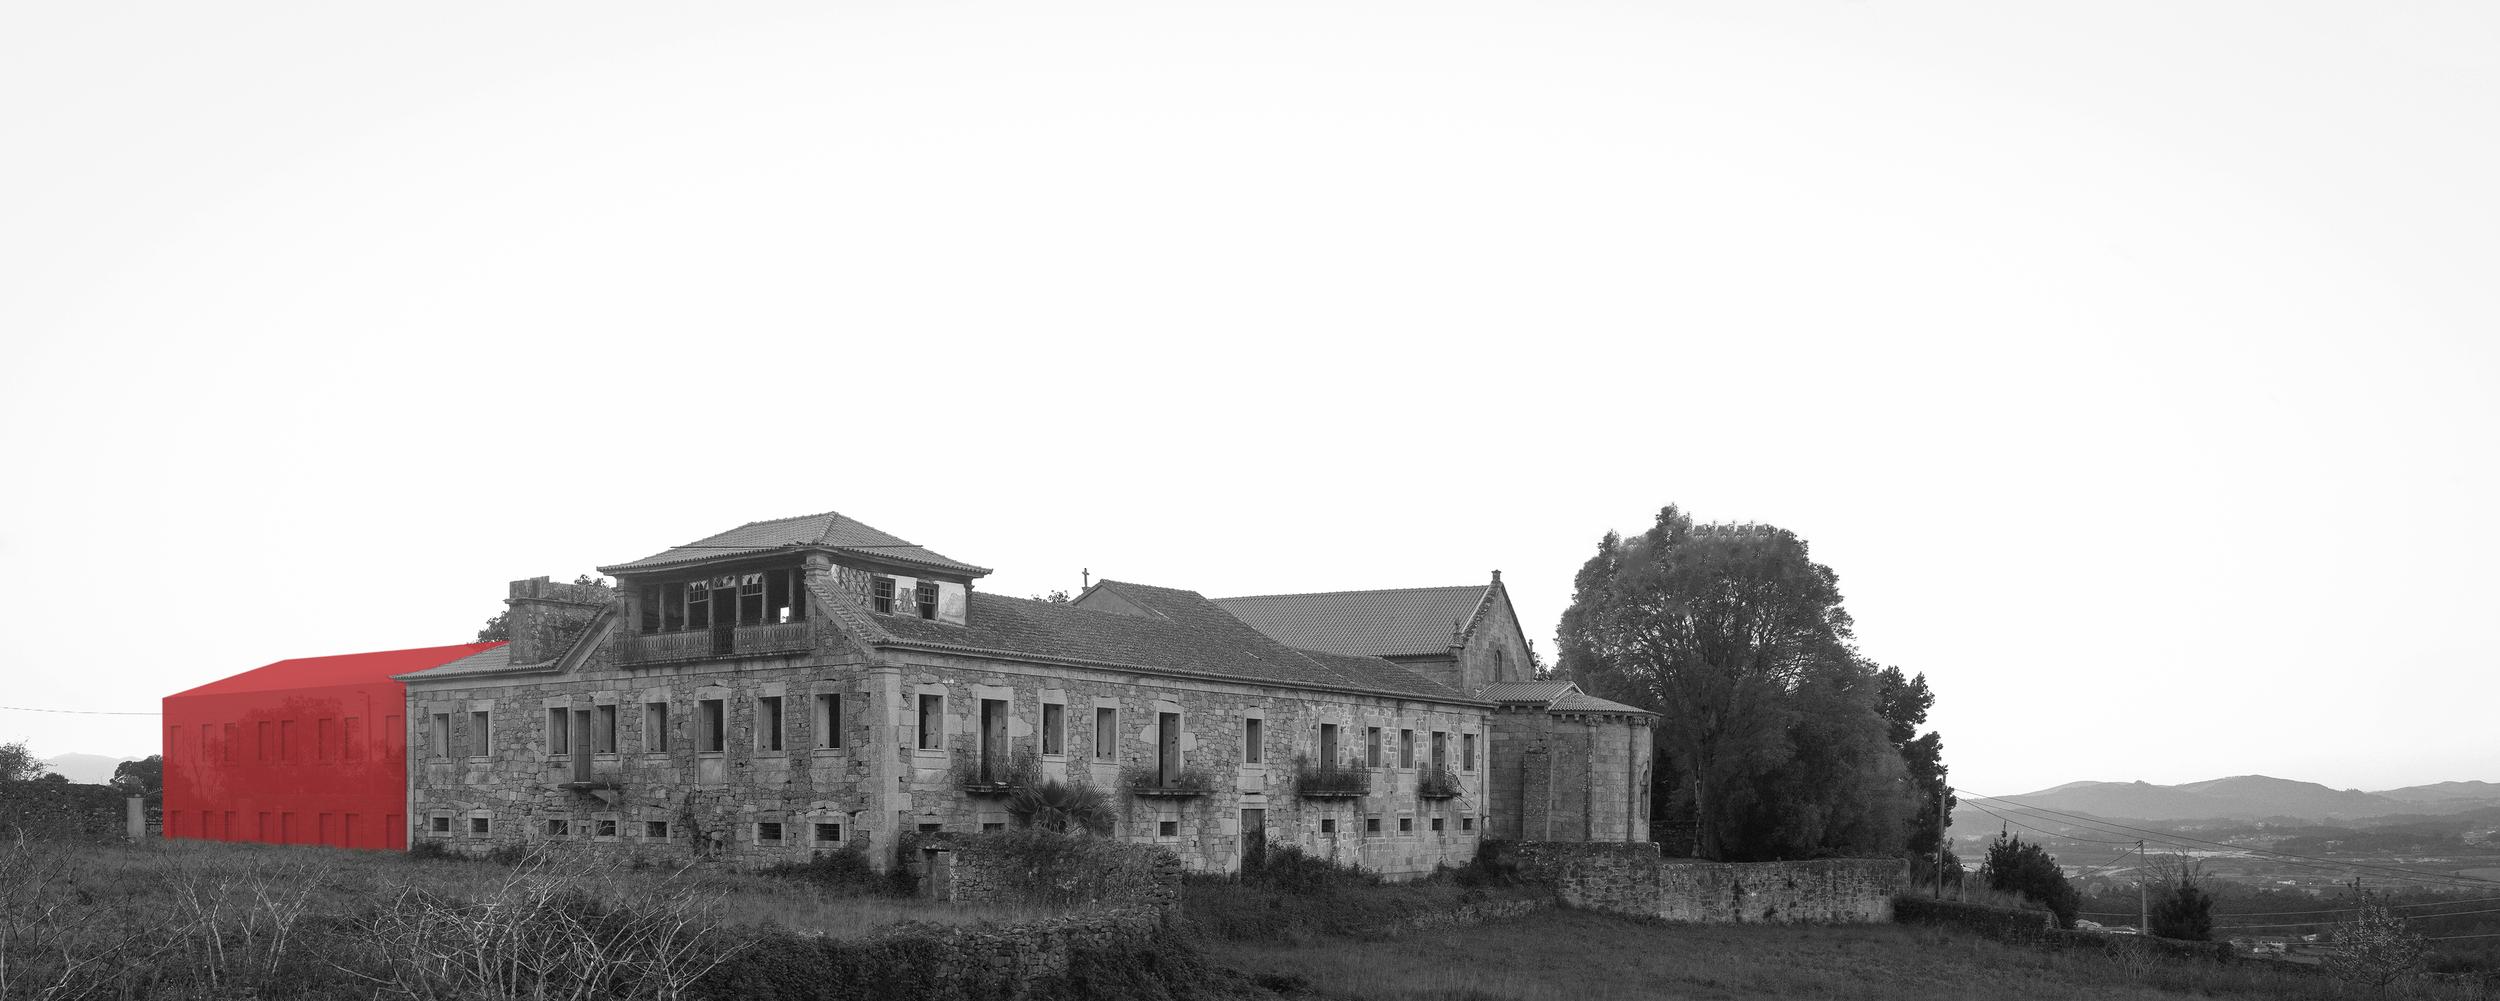 Longos_Vales_Monastery_PROD_Architecture_General_View(B&W).jpg